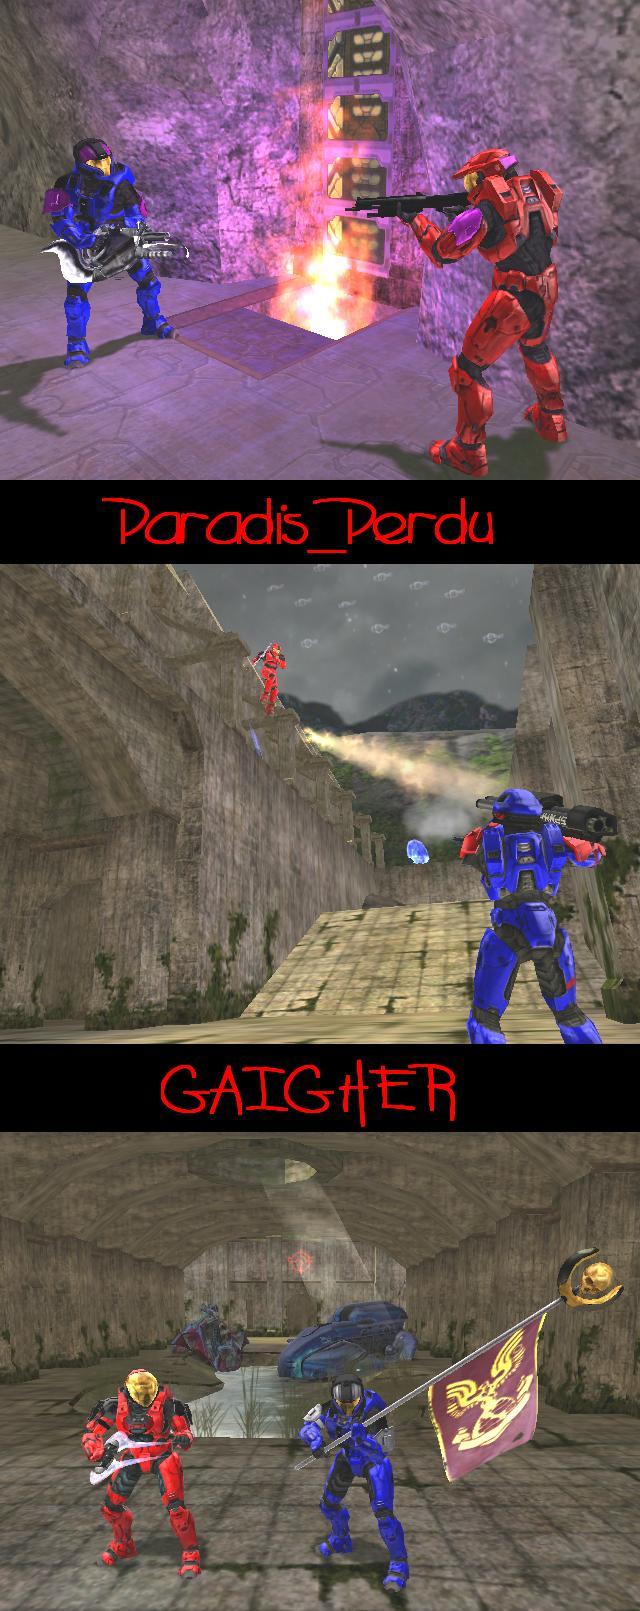 Paradis_Perdu Paradis Perdu maphaloce map halo ce maphalo halomap carte cartes création GAIGHER mod